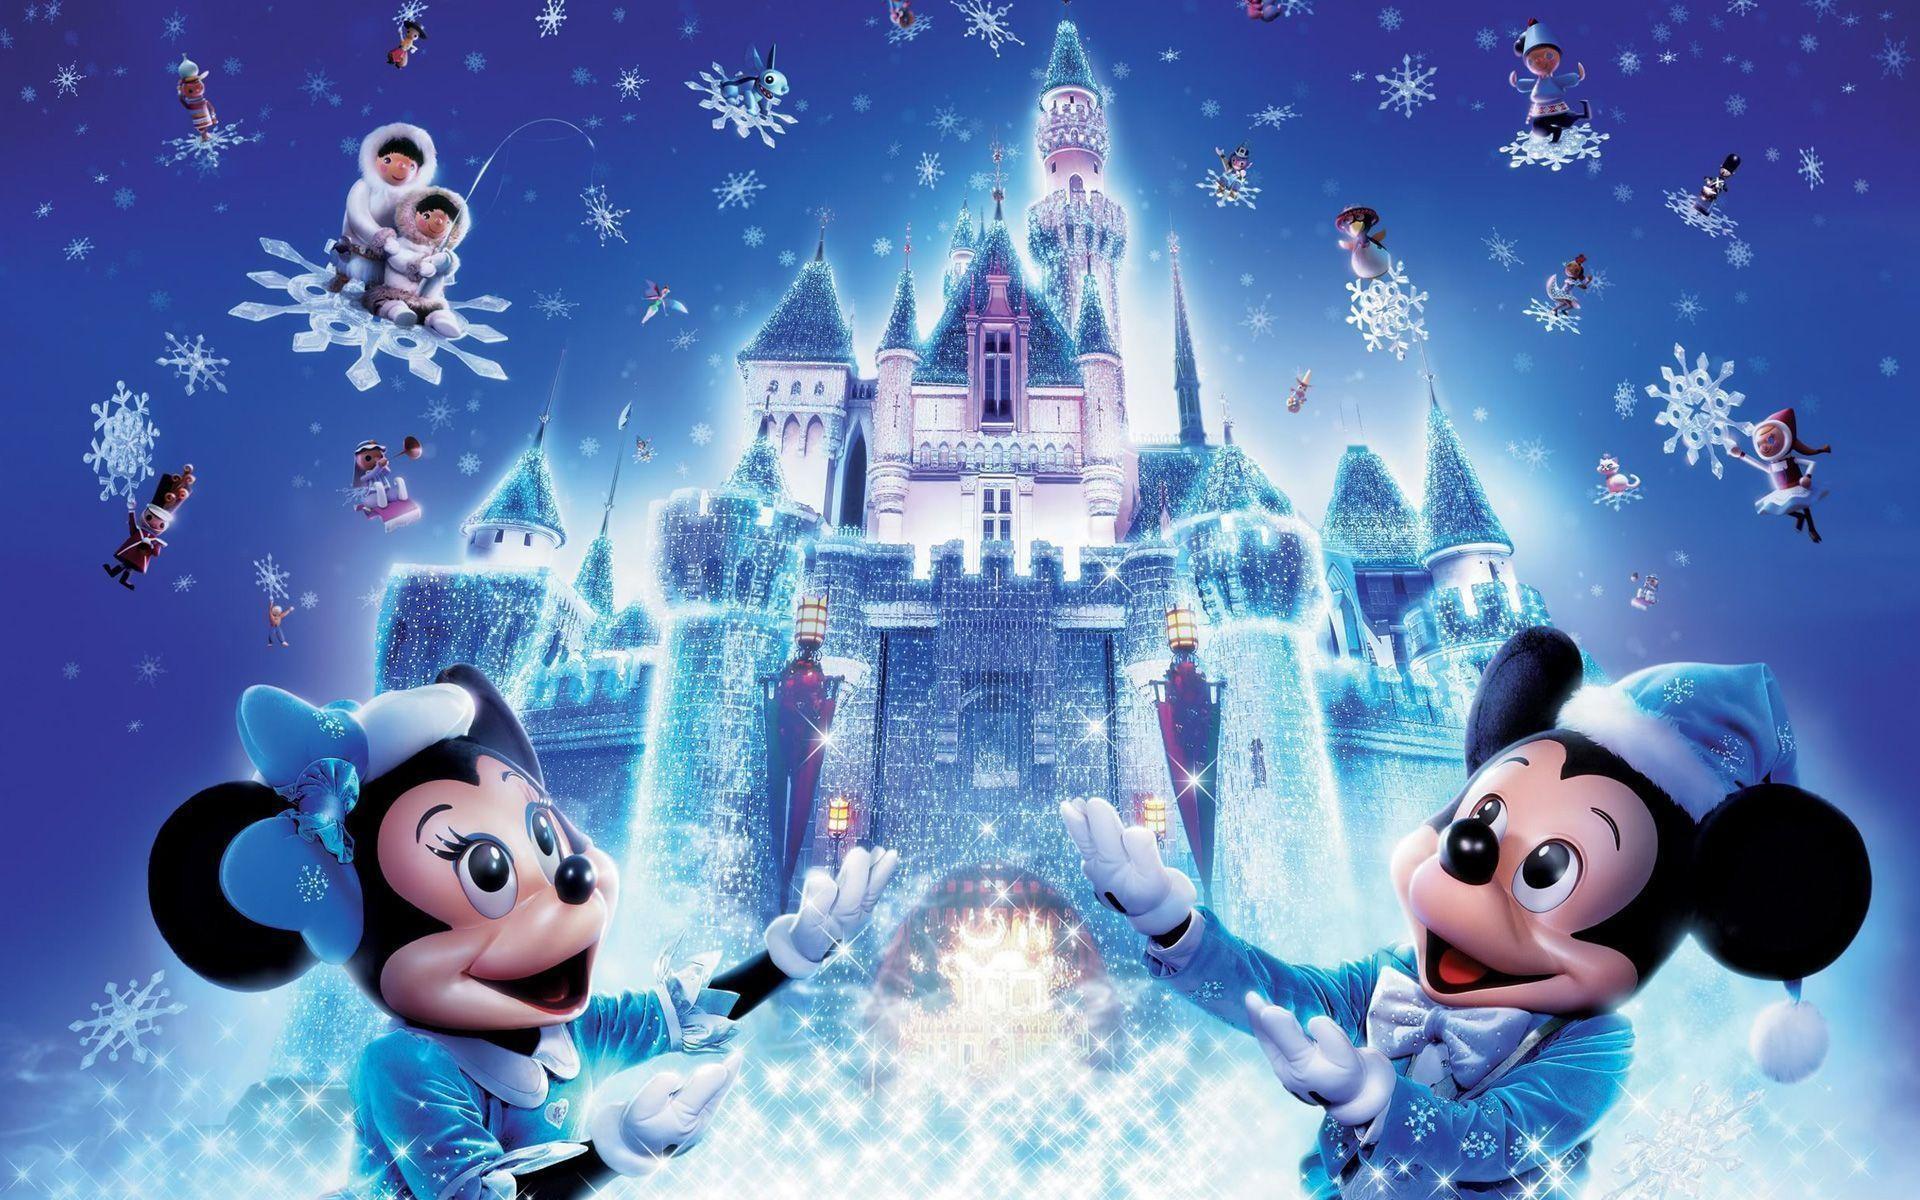 Live Christmas Wallpaper For Pc: Christmas Pc Wallpaper #835 |.Ssofc